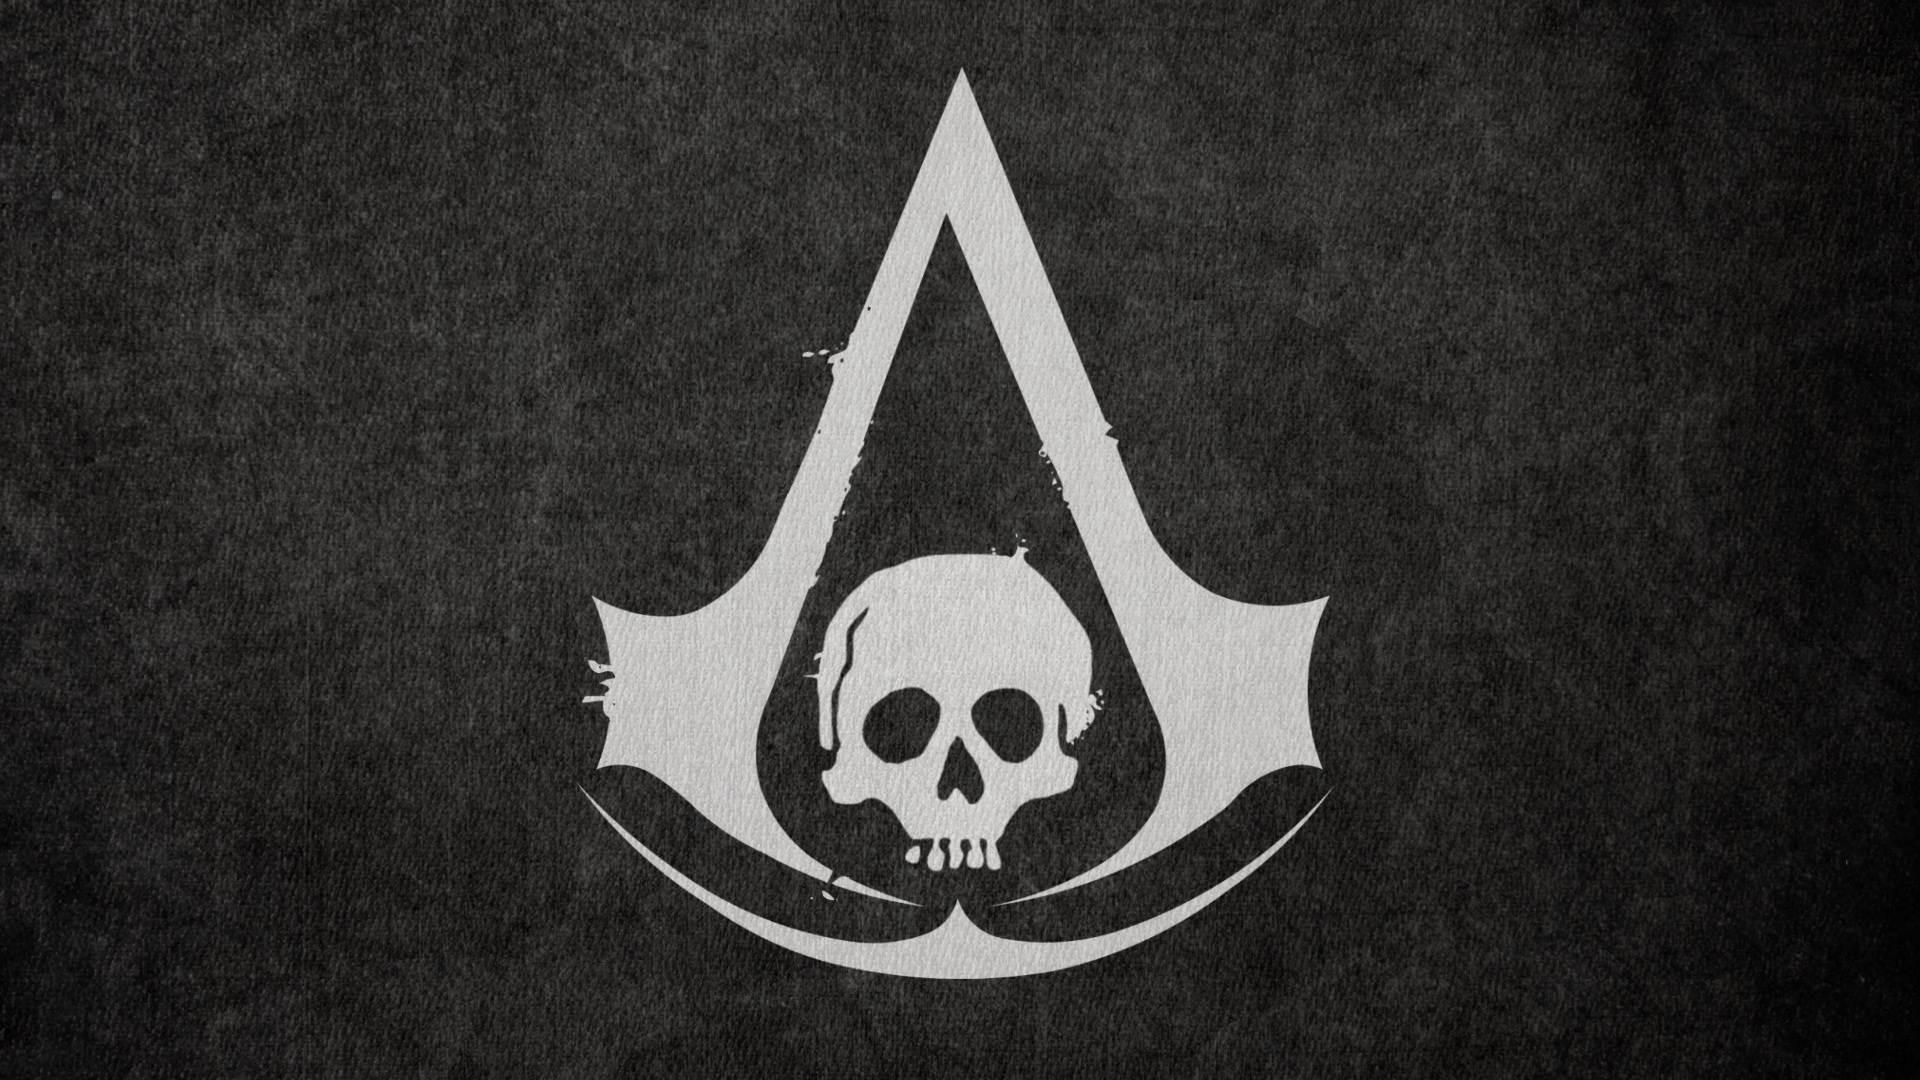 Assassin's Creed Black Flag Wallpaper Logo Wallpaper